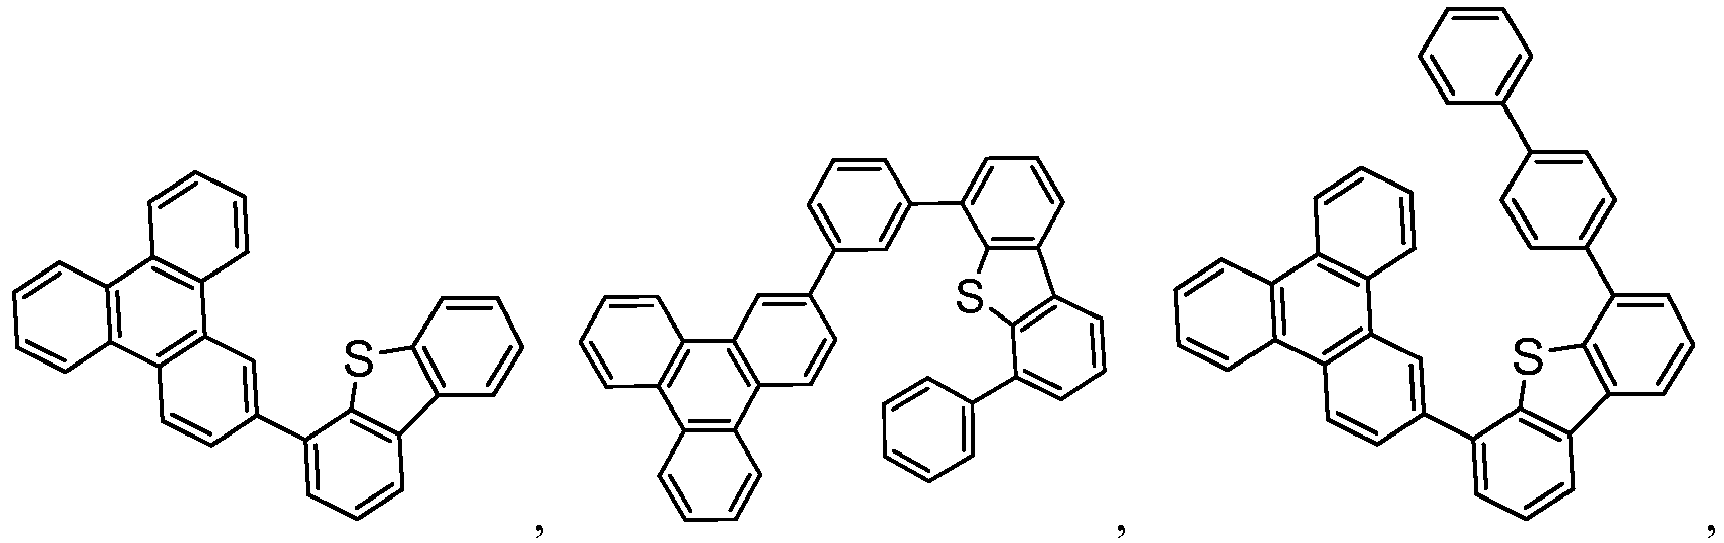 Figure imgb0882